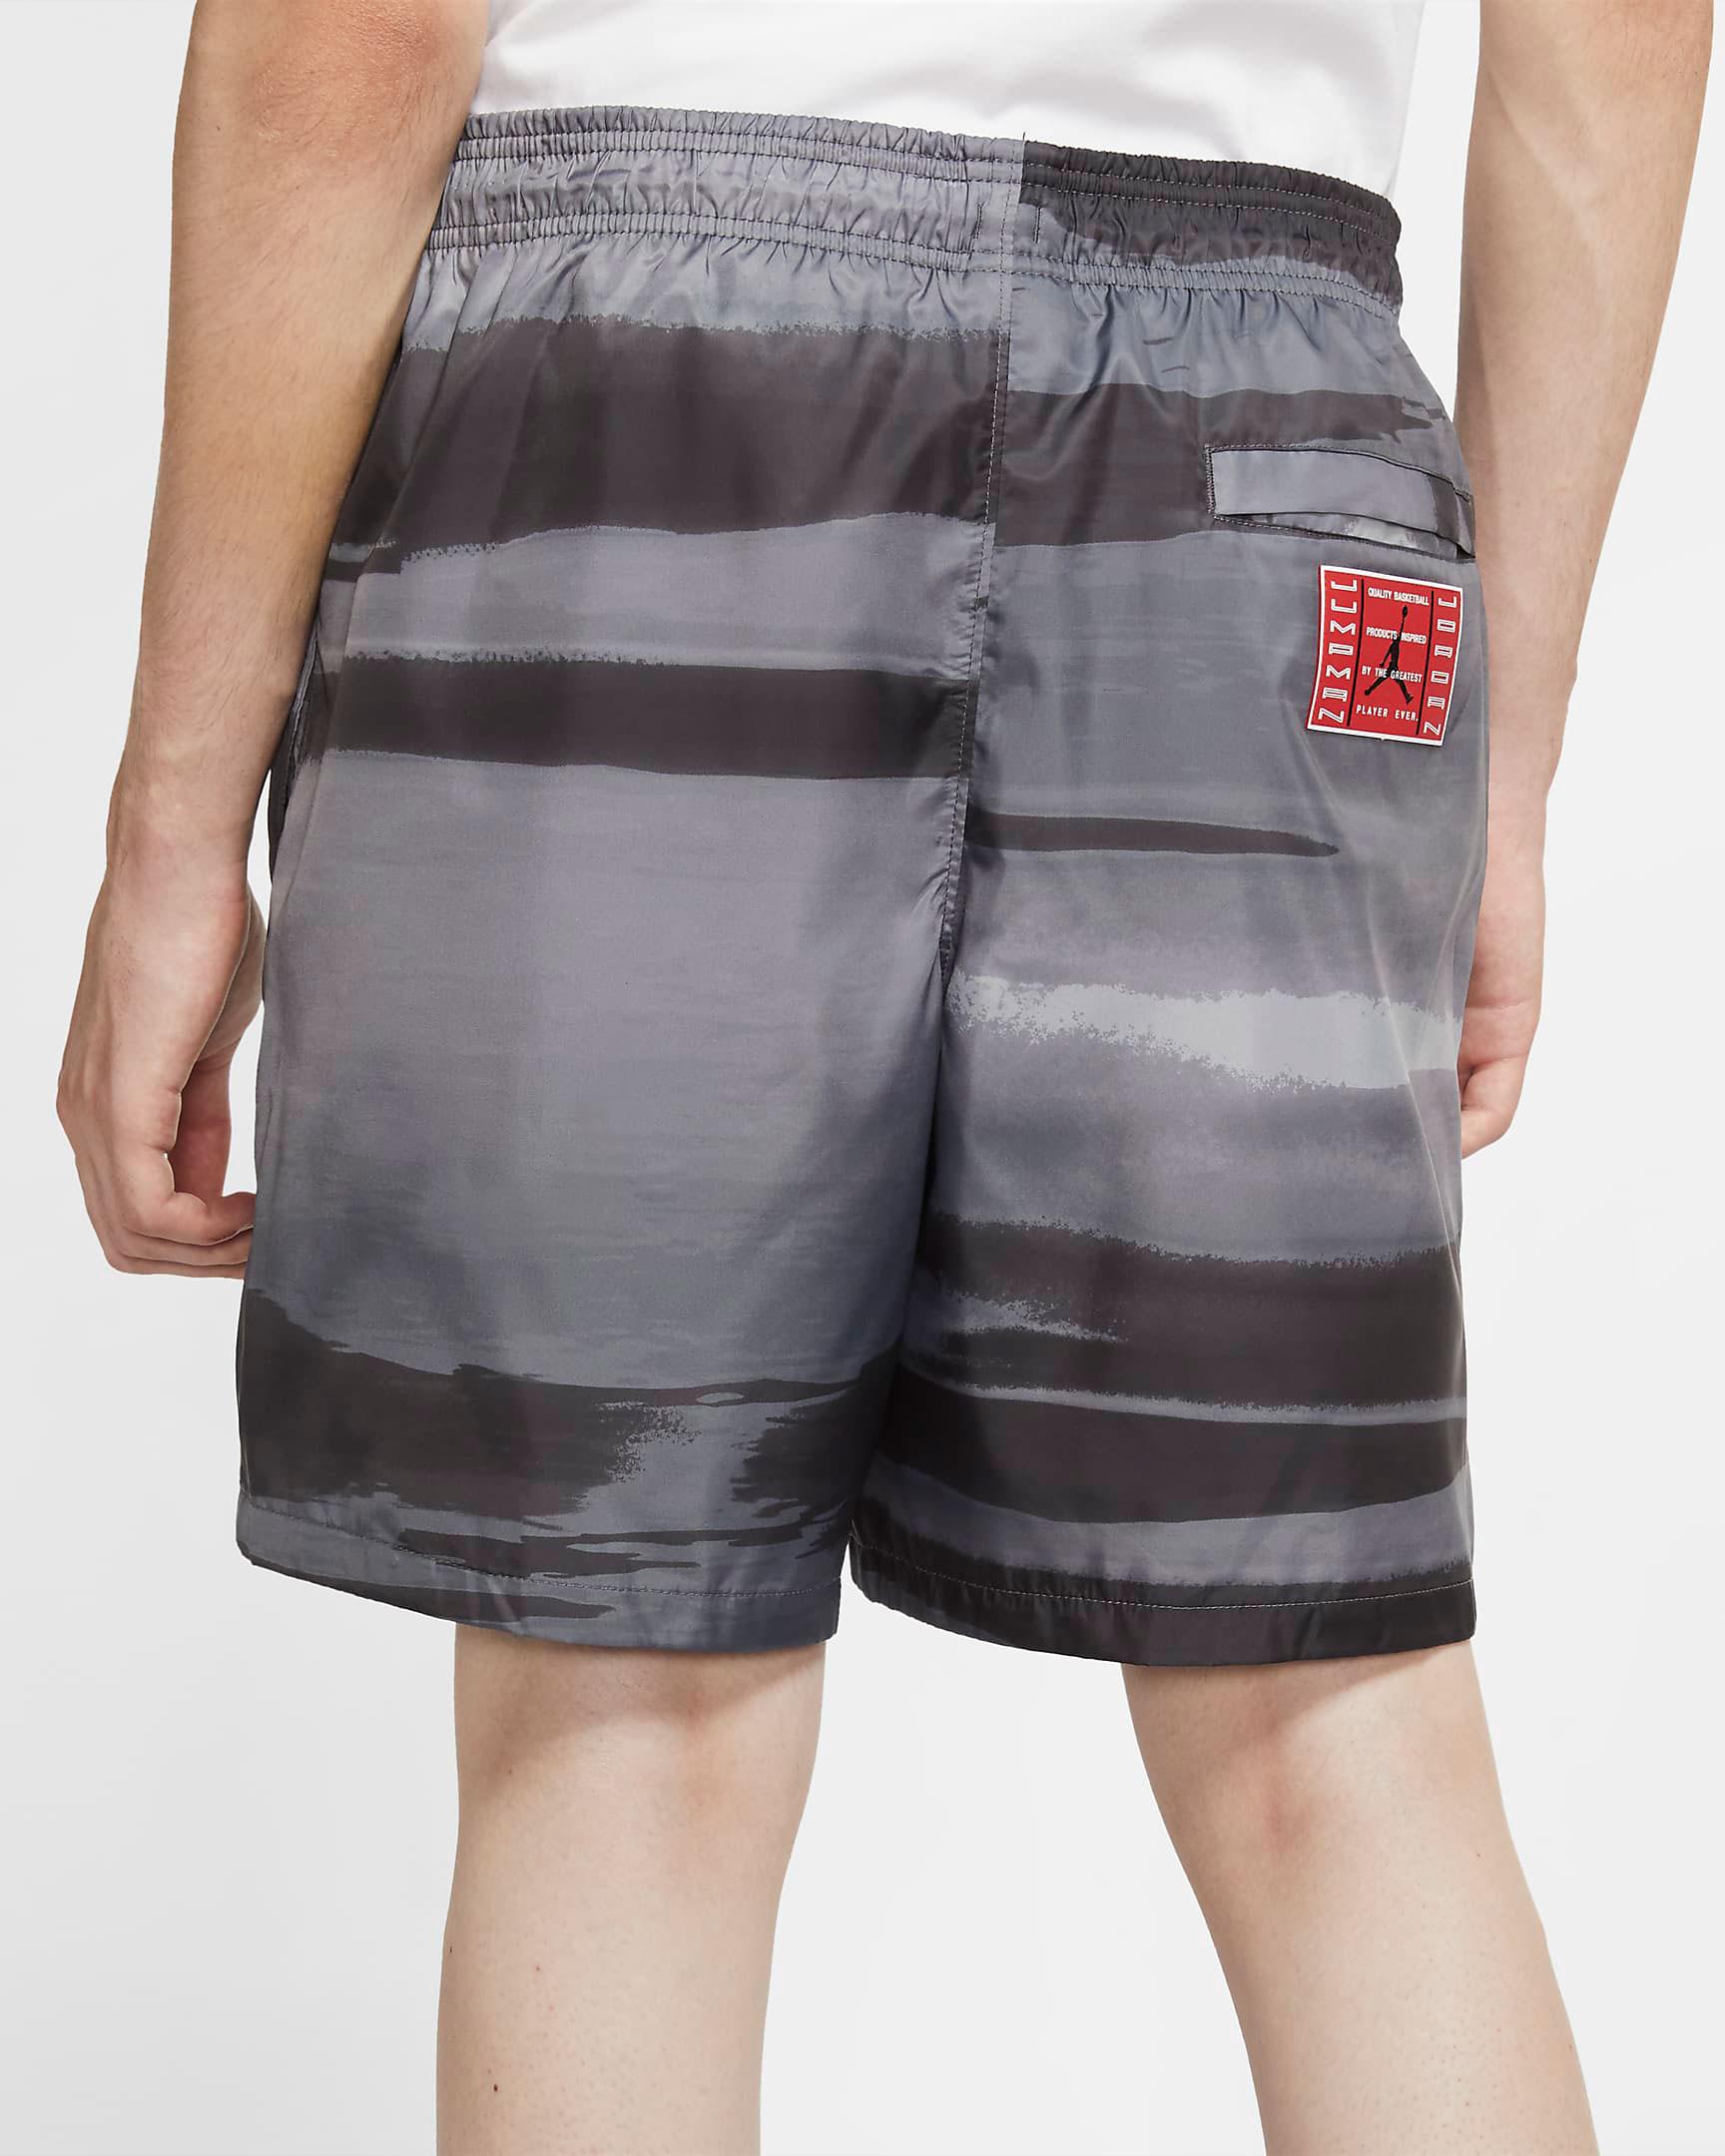 air-jordan-11-low-ie-black-cement-shorts-to-match-2